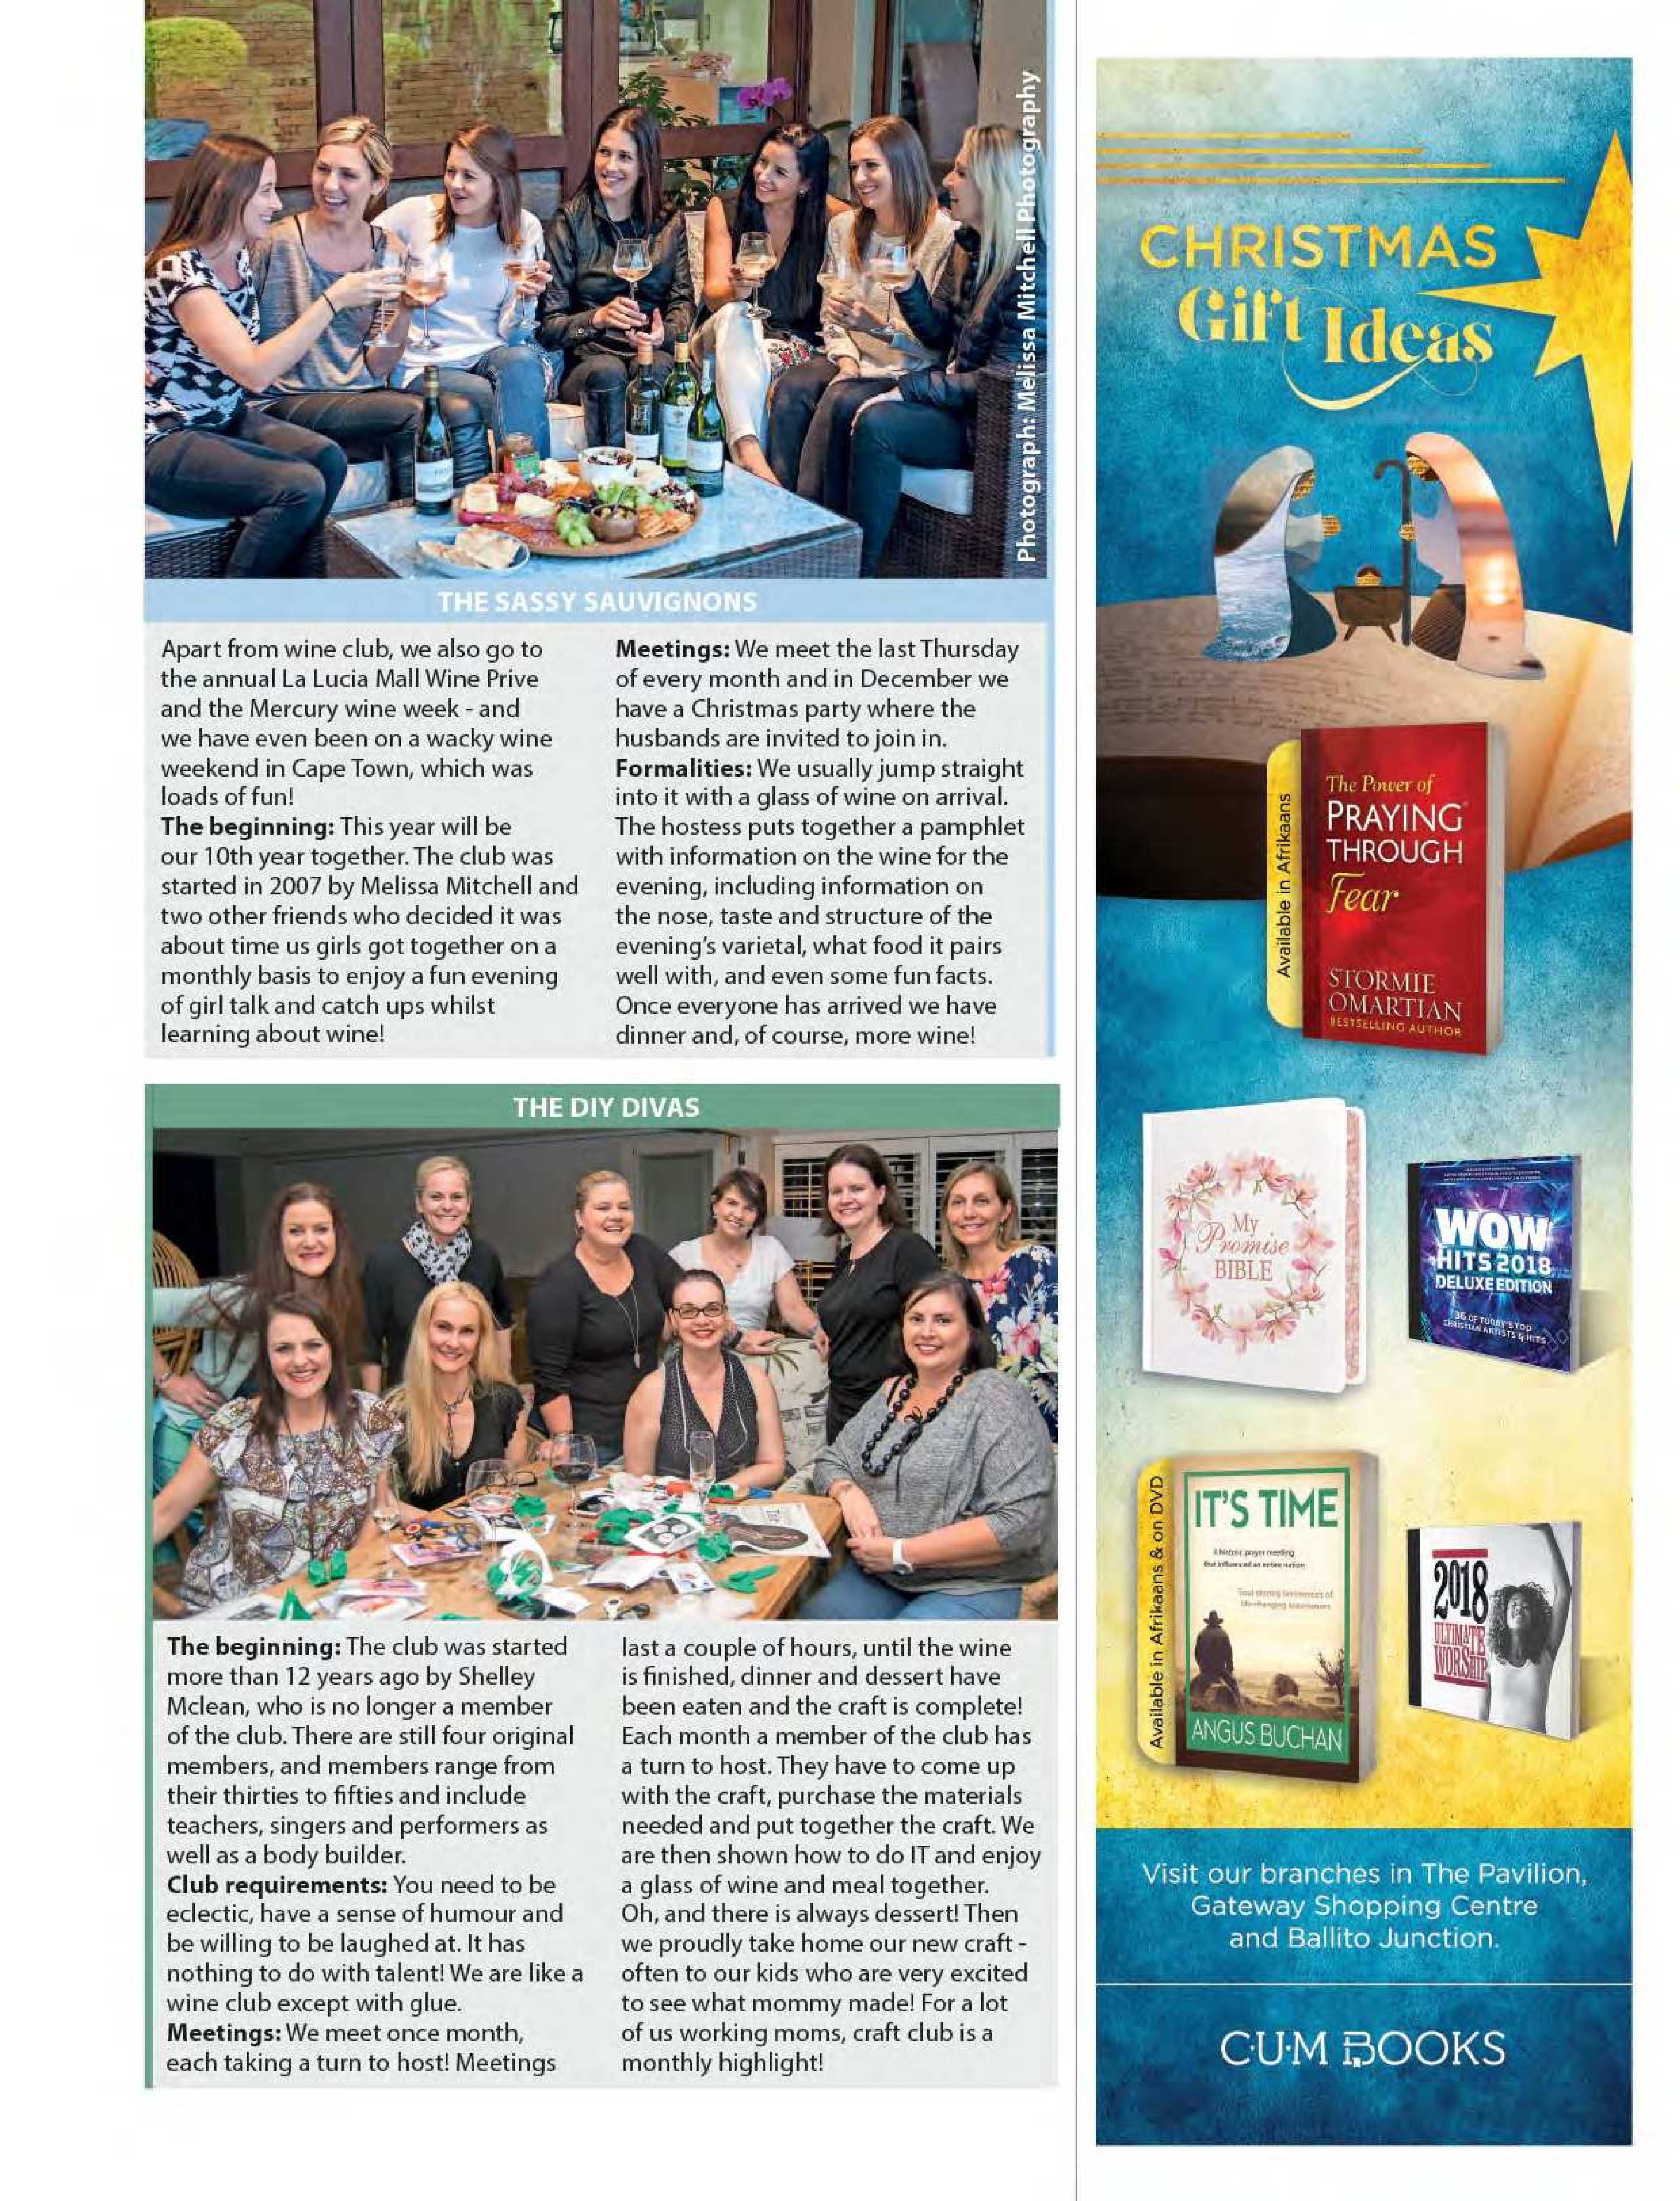 get-magazine-ballitoumhlanga-december-2017-january-2018-2-epapers-page-25